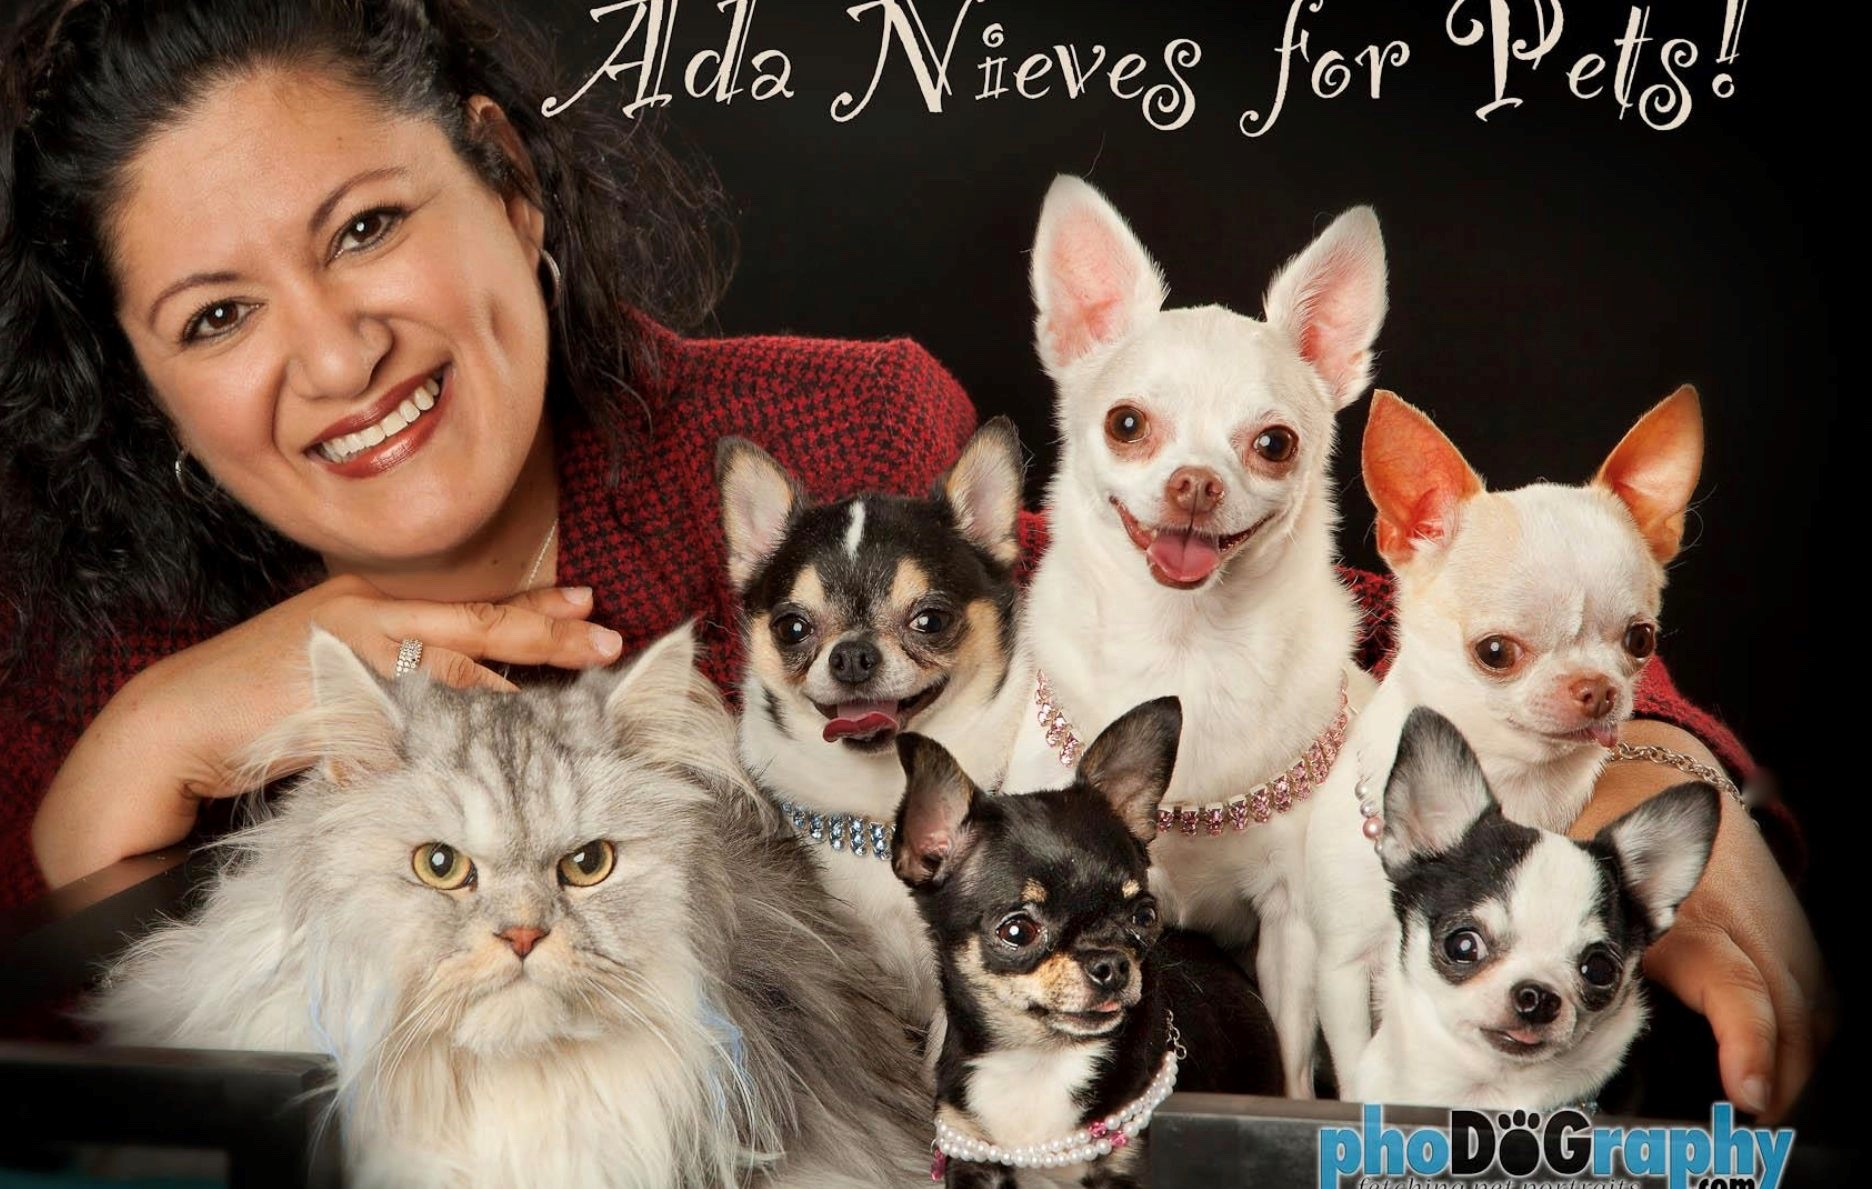 Meet the Designer – Ada Nieves